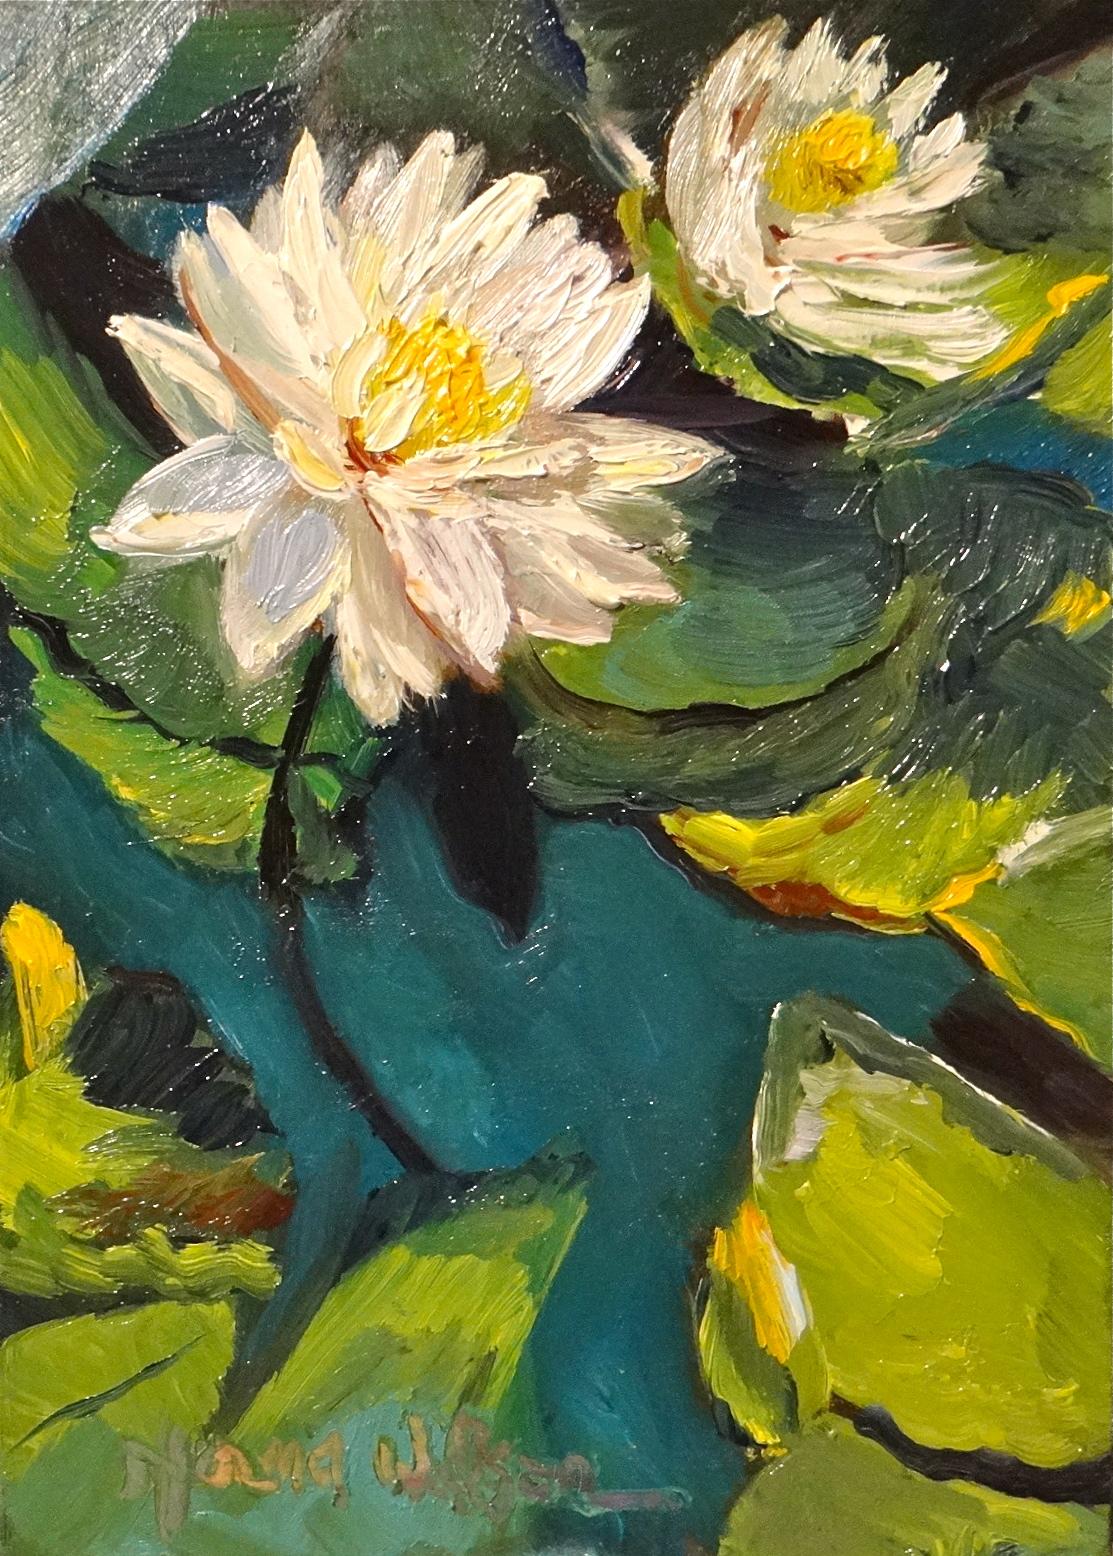 Norma wilson art lovely lotus floral landscape painting art lovely lotus floral landscape painting art izmirmasajfo